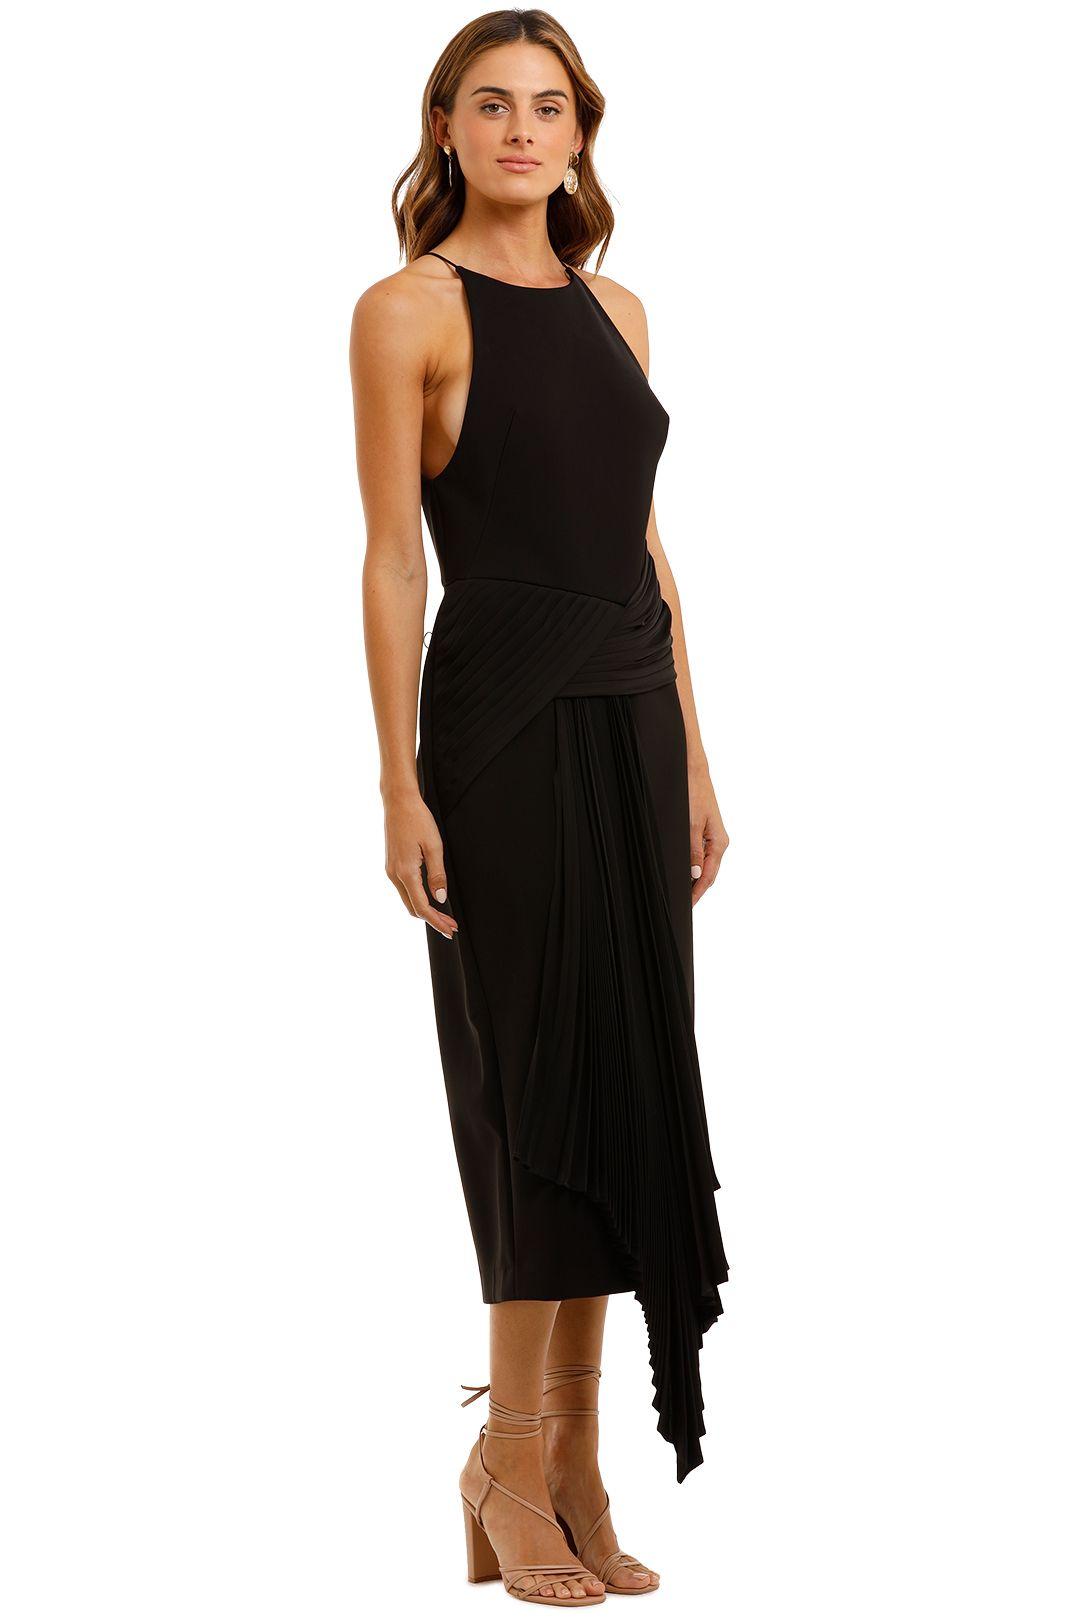 Acler Bercy Midi Dress Draped